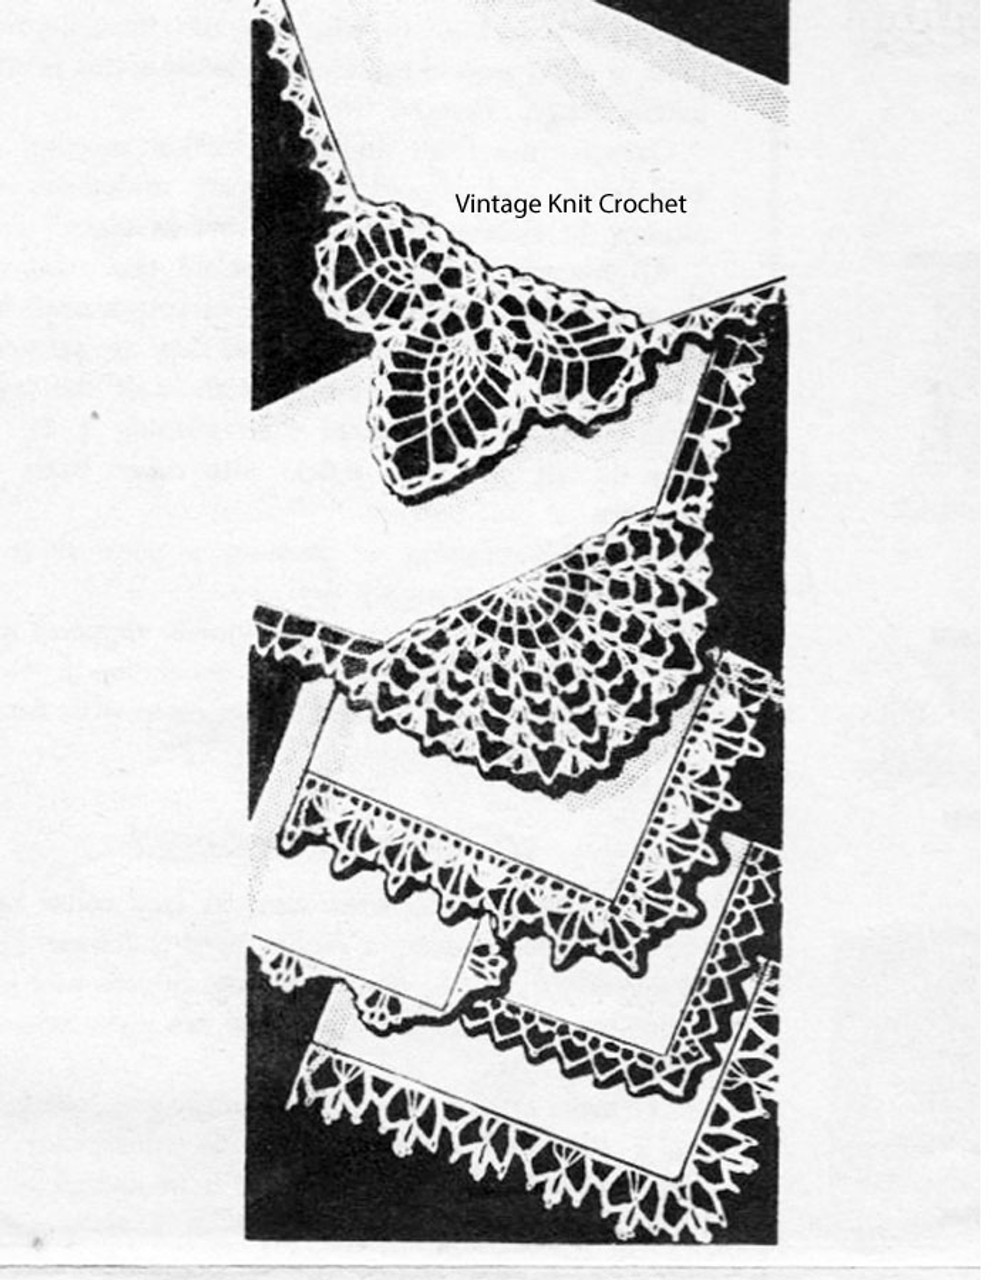 Handkerchief Crochet Edging Pattern, American Weekly 3119